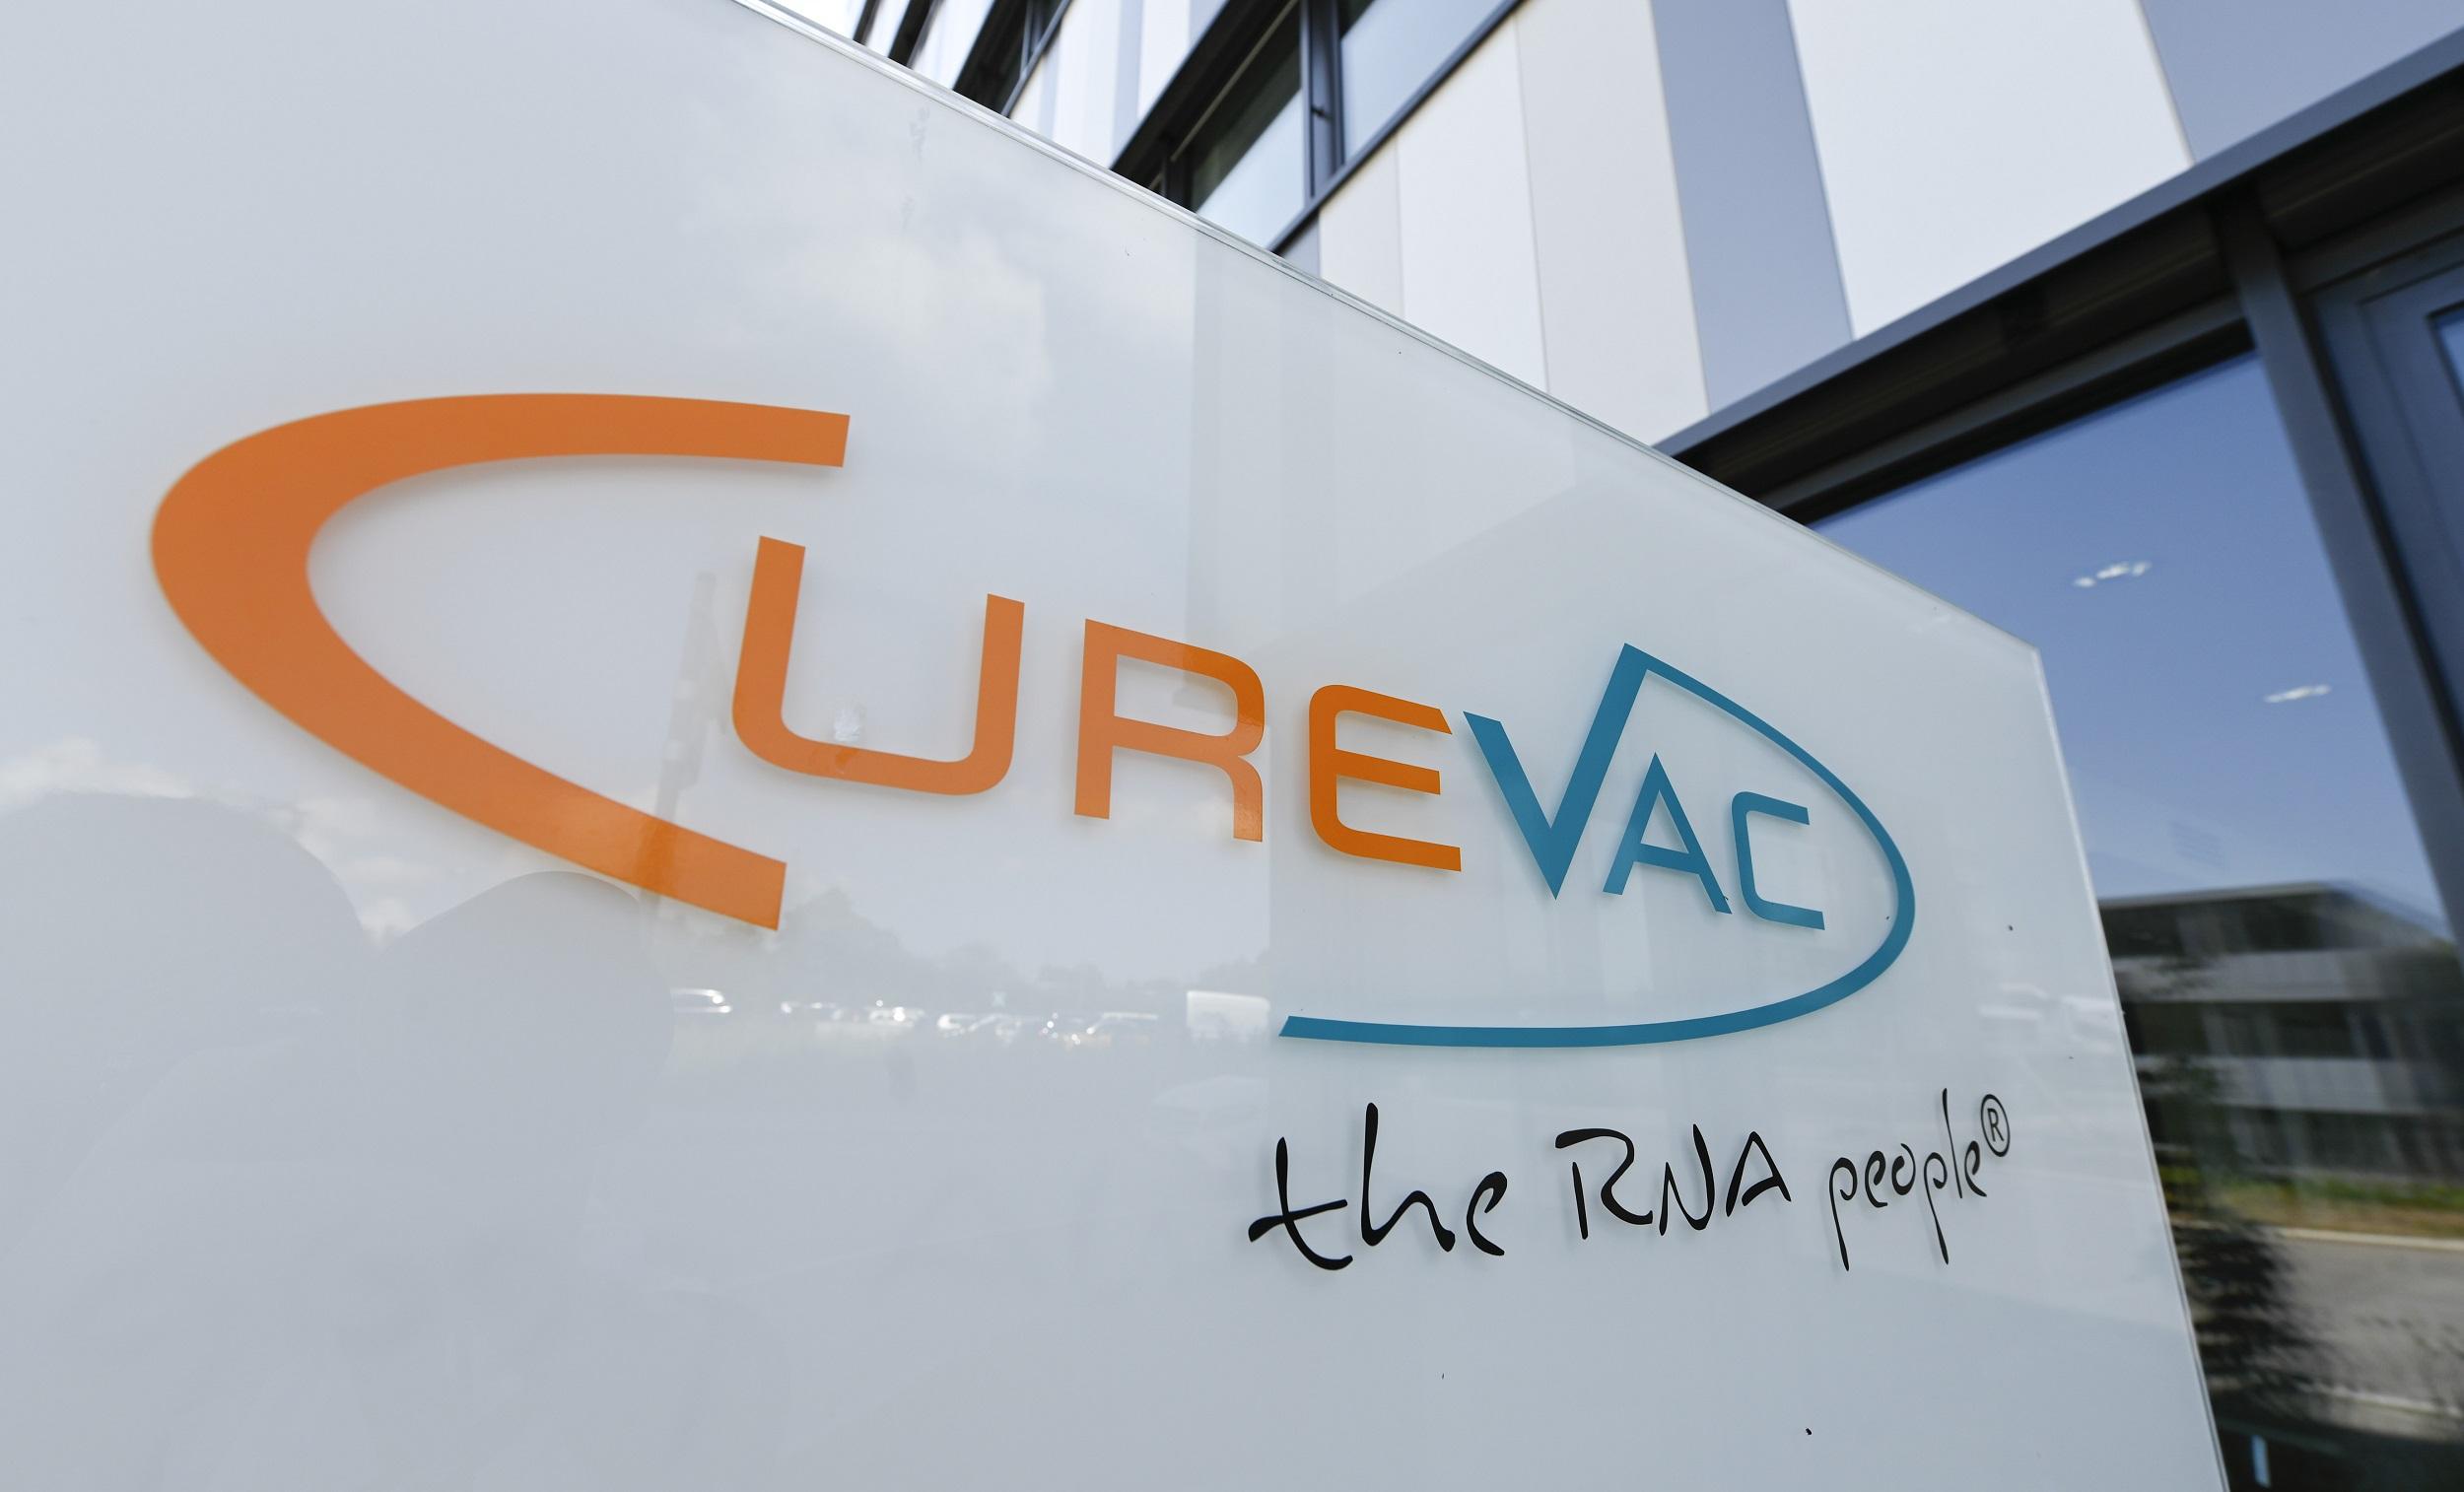 Coronavirus vaccine developer CureVac raises $213 million in IPO